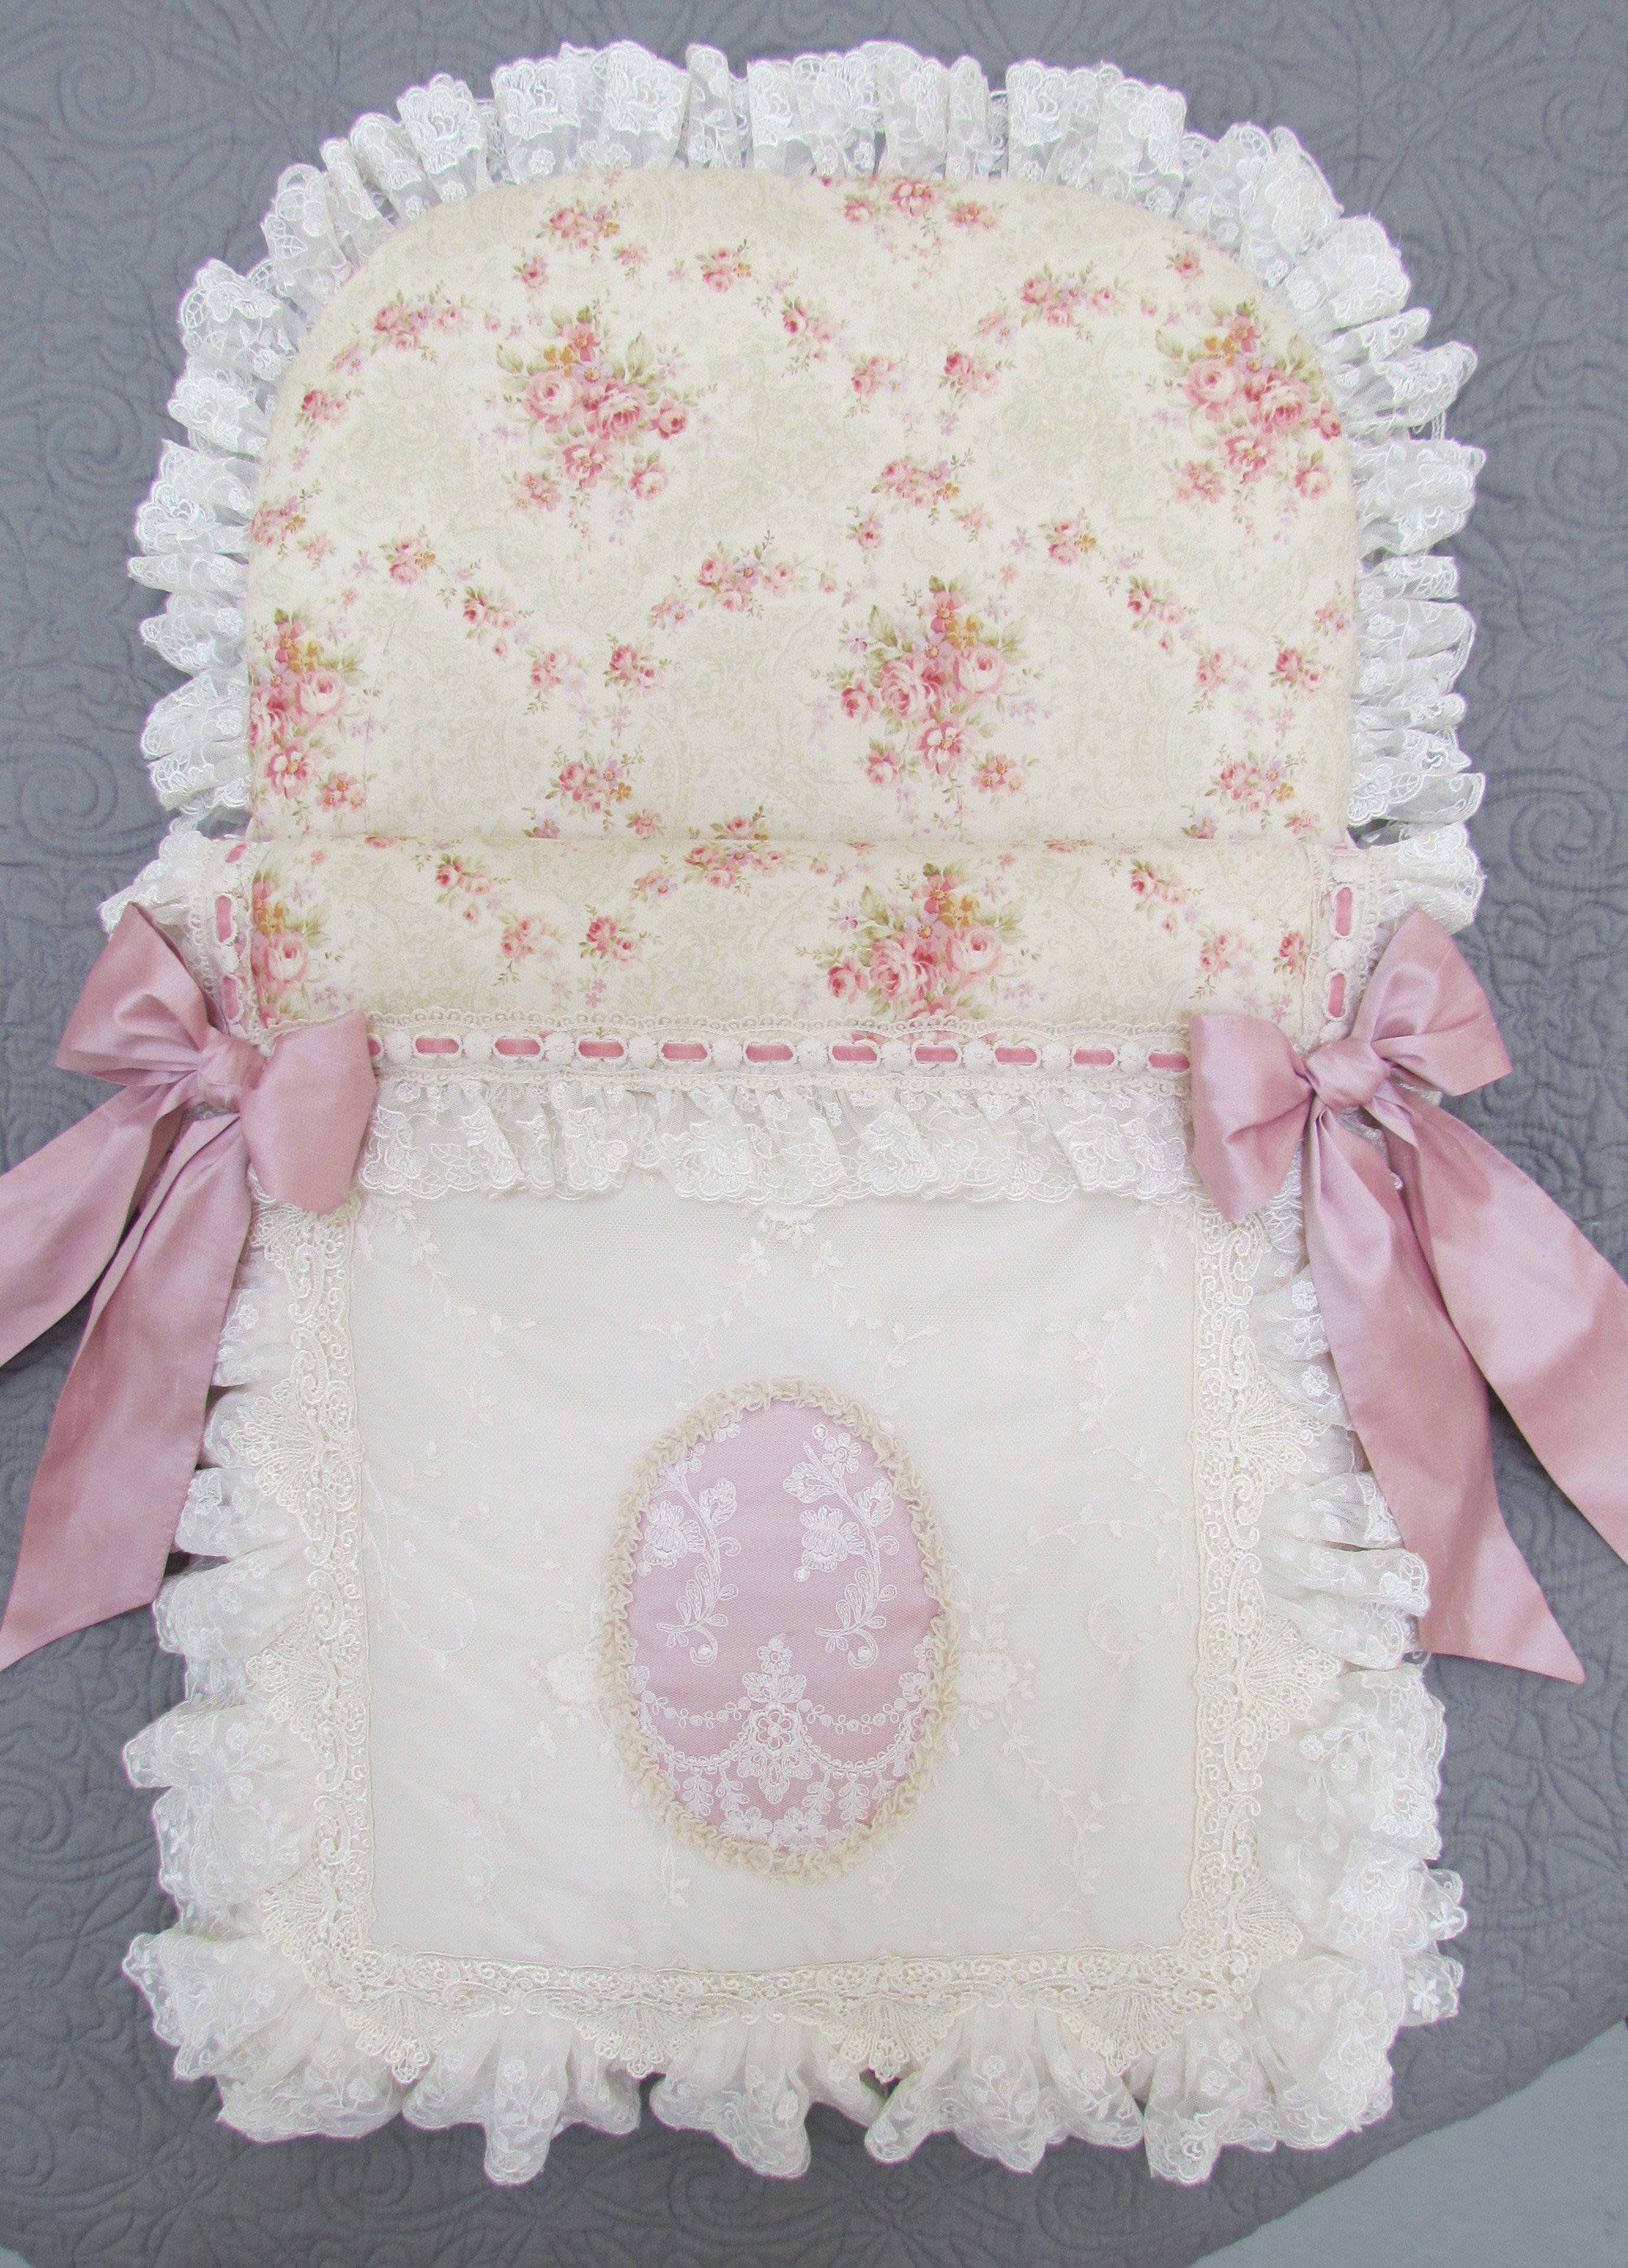 Floral cotton baby nest | Angela Lace Creations | Pinterest